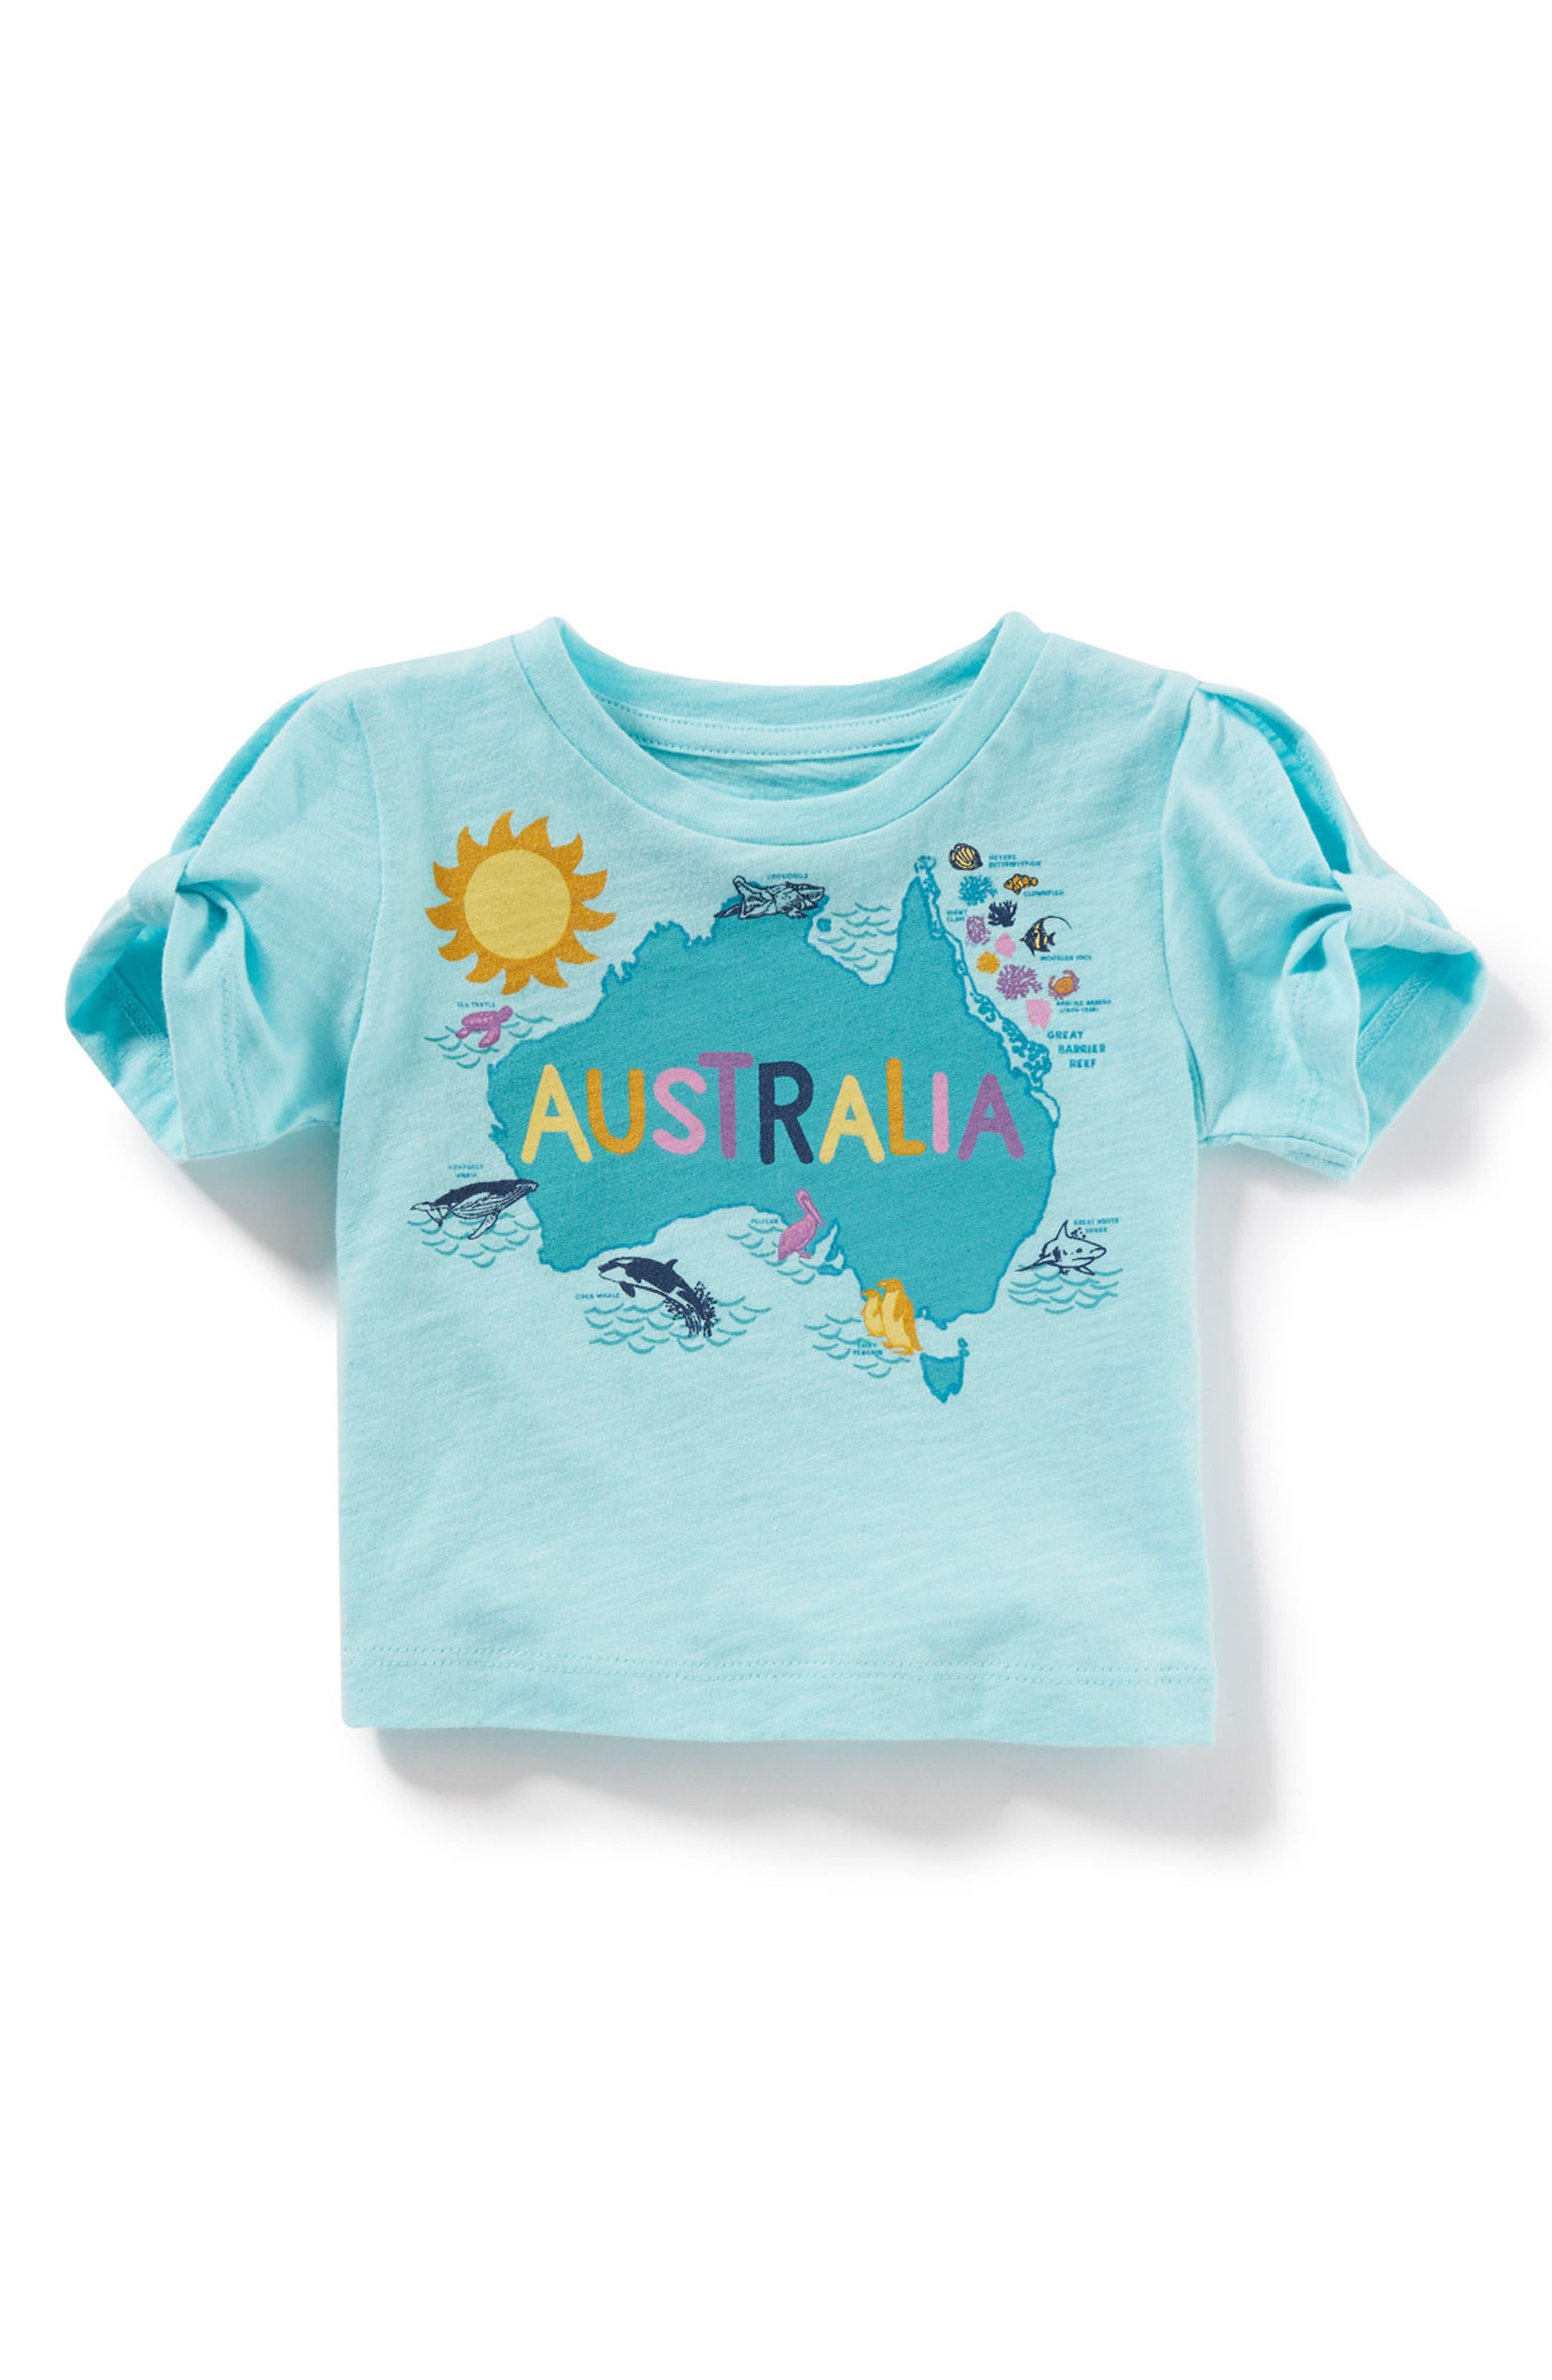 Australia Tee,                         Main,                         color, 400